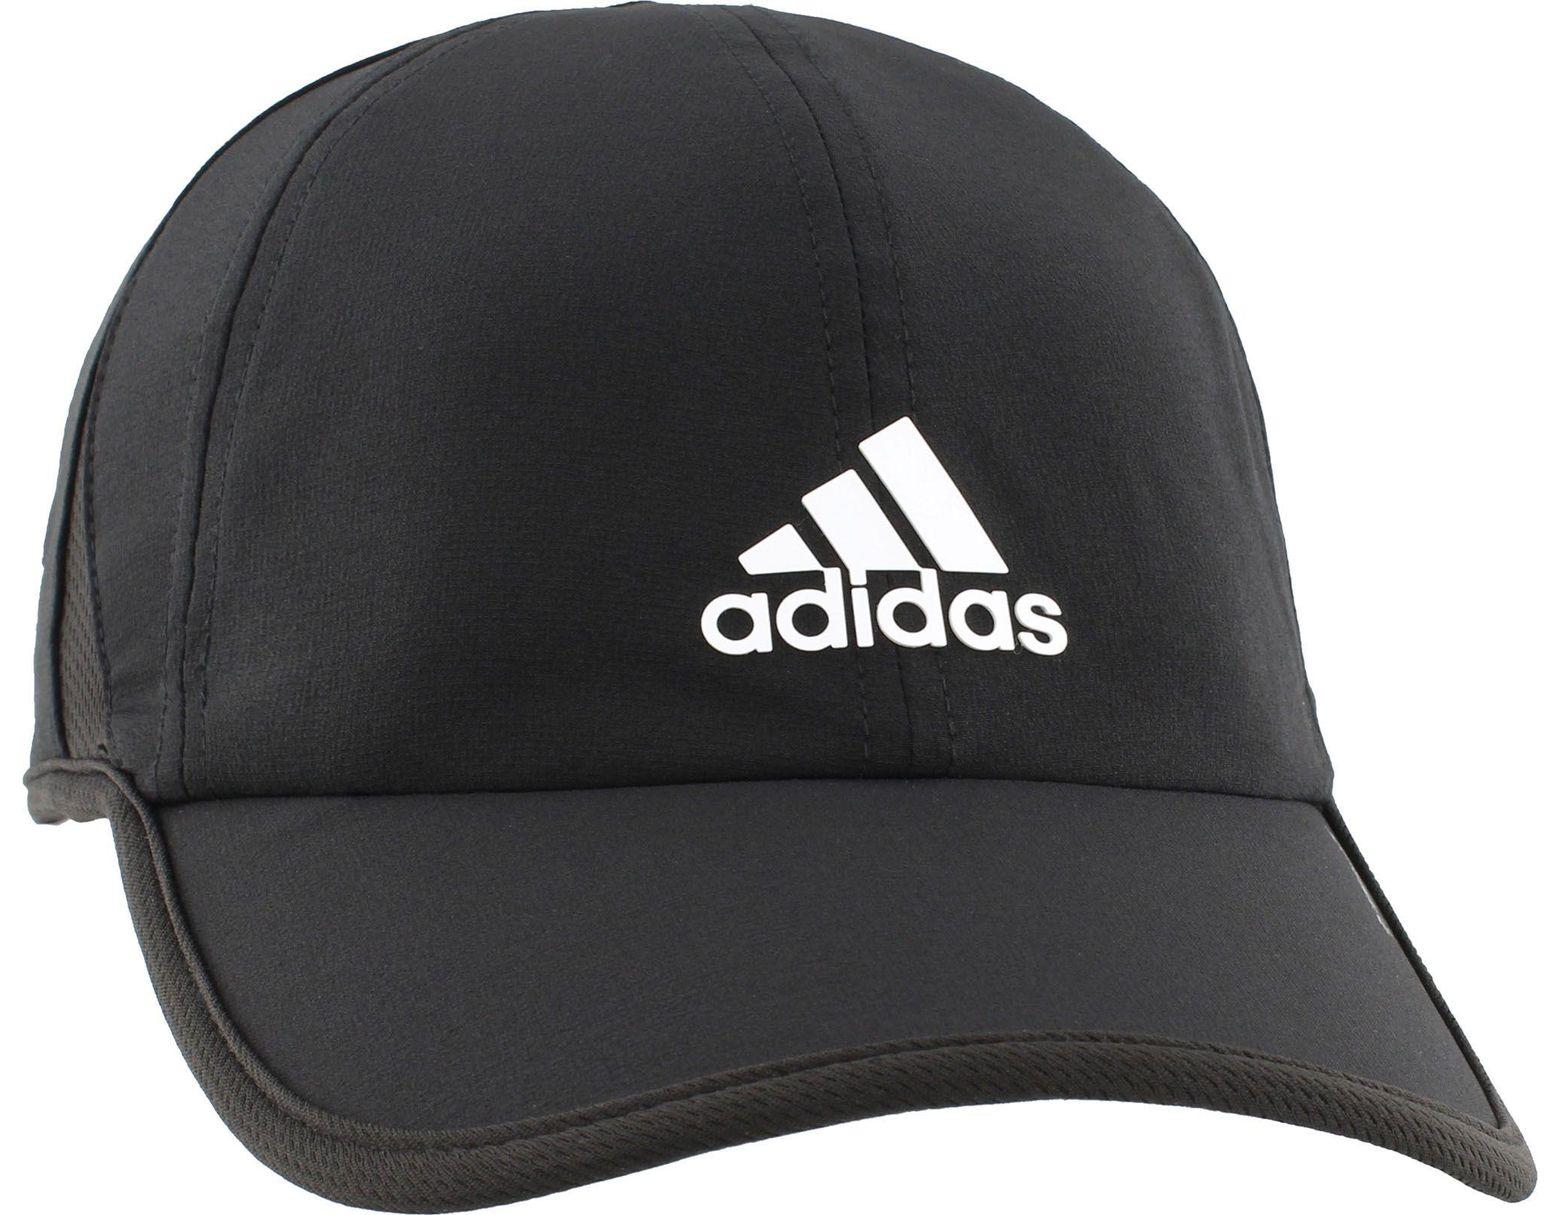 7b326659b319d adidas Superlite Hat in Black for Men - Save 27% - Lyst